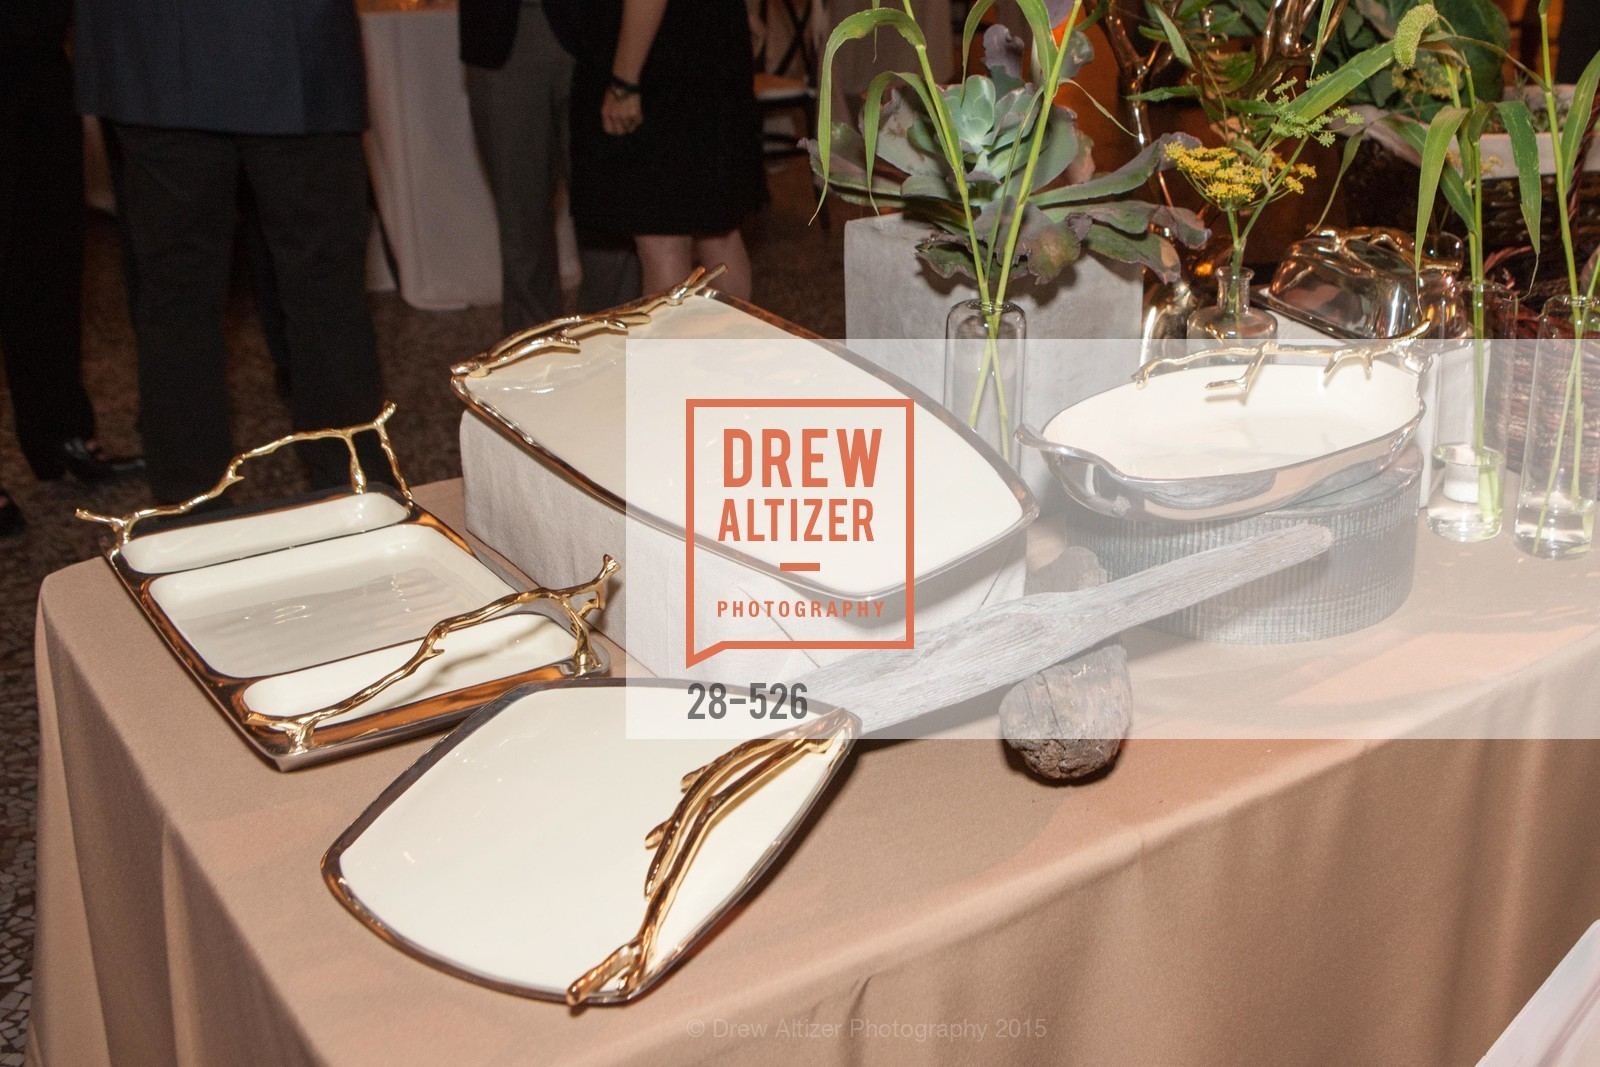 Atmosphere, Slide Ranch Silver Trowel Awards Dinner & Fundraiser, San Francisco Ferry Building. 2525 Van Ness St, November 12th, 2015